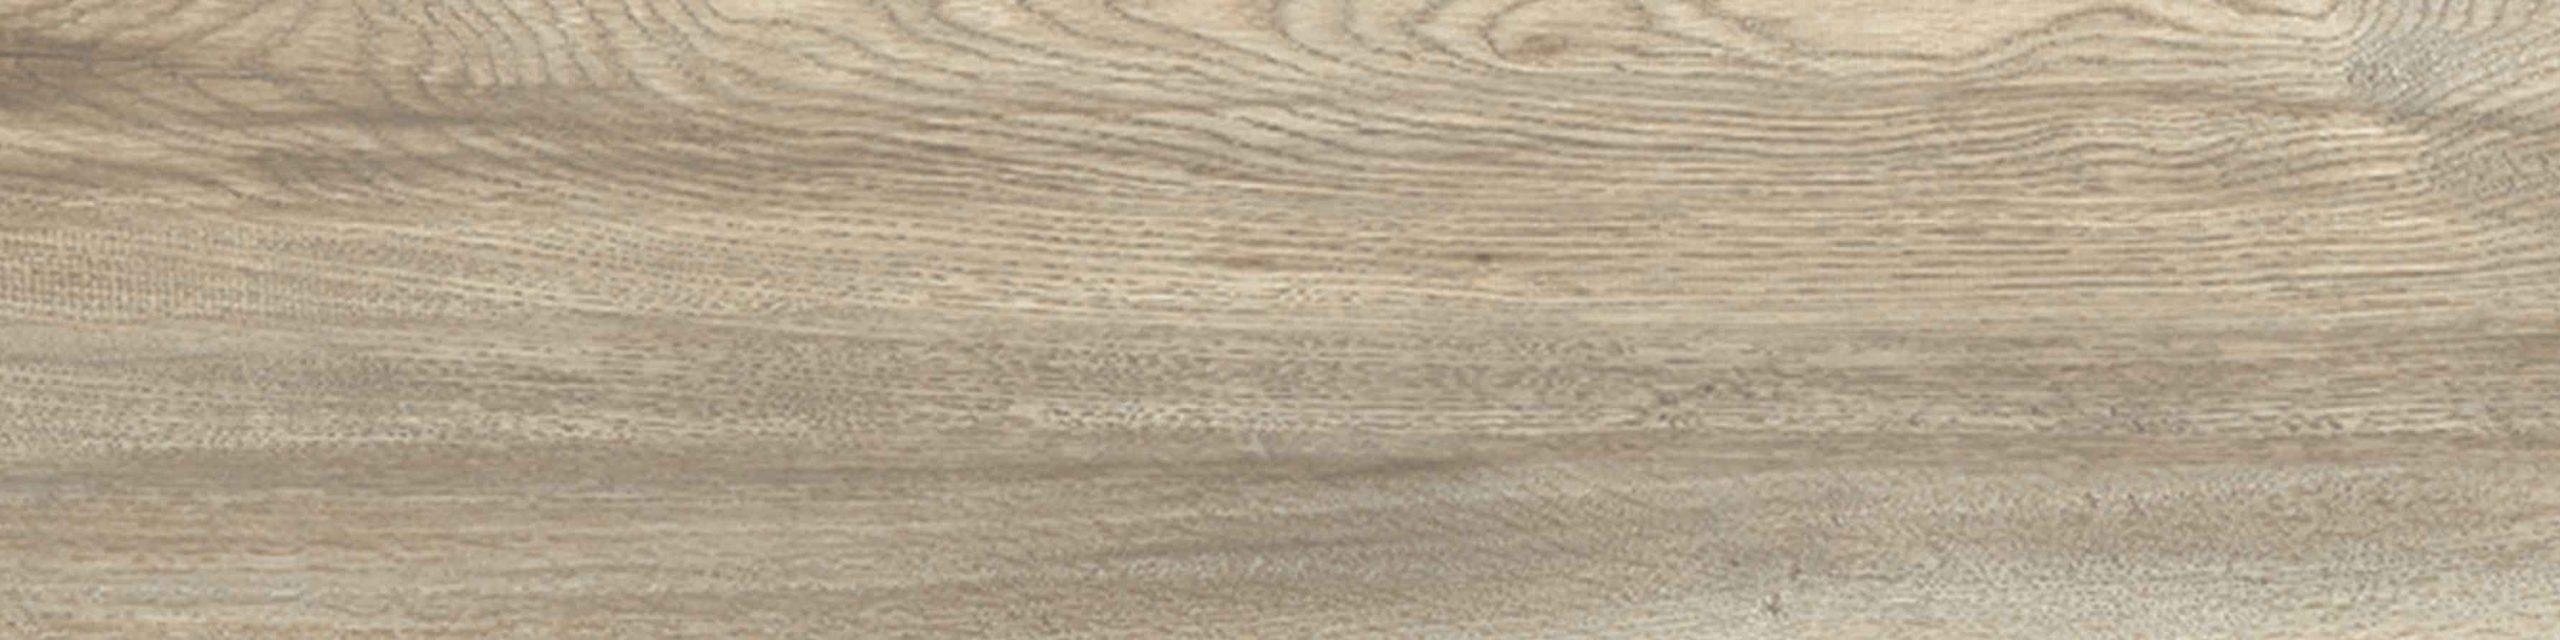 Details Wood Beige Matte 10mm 30 x 120